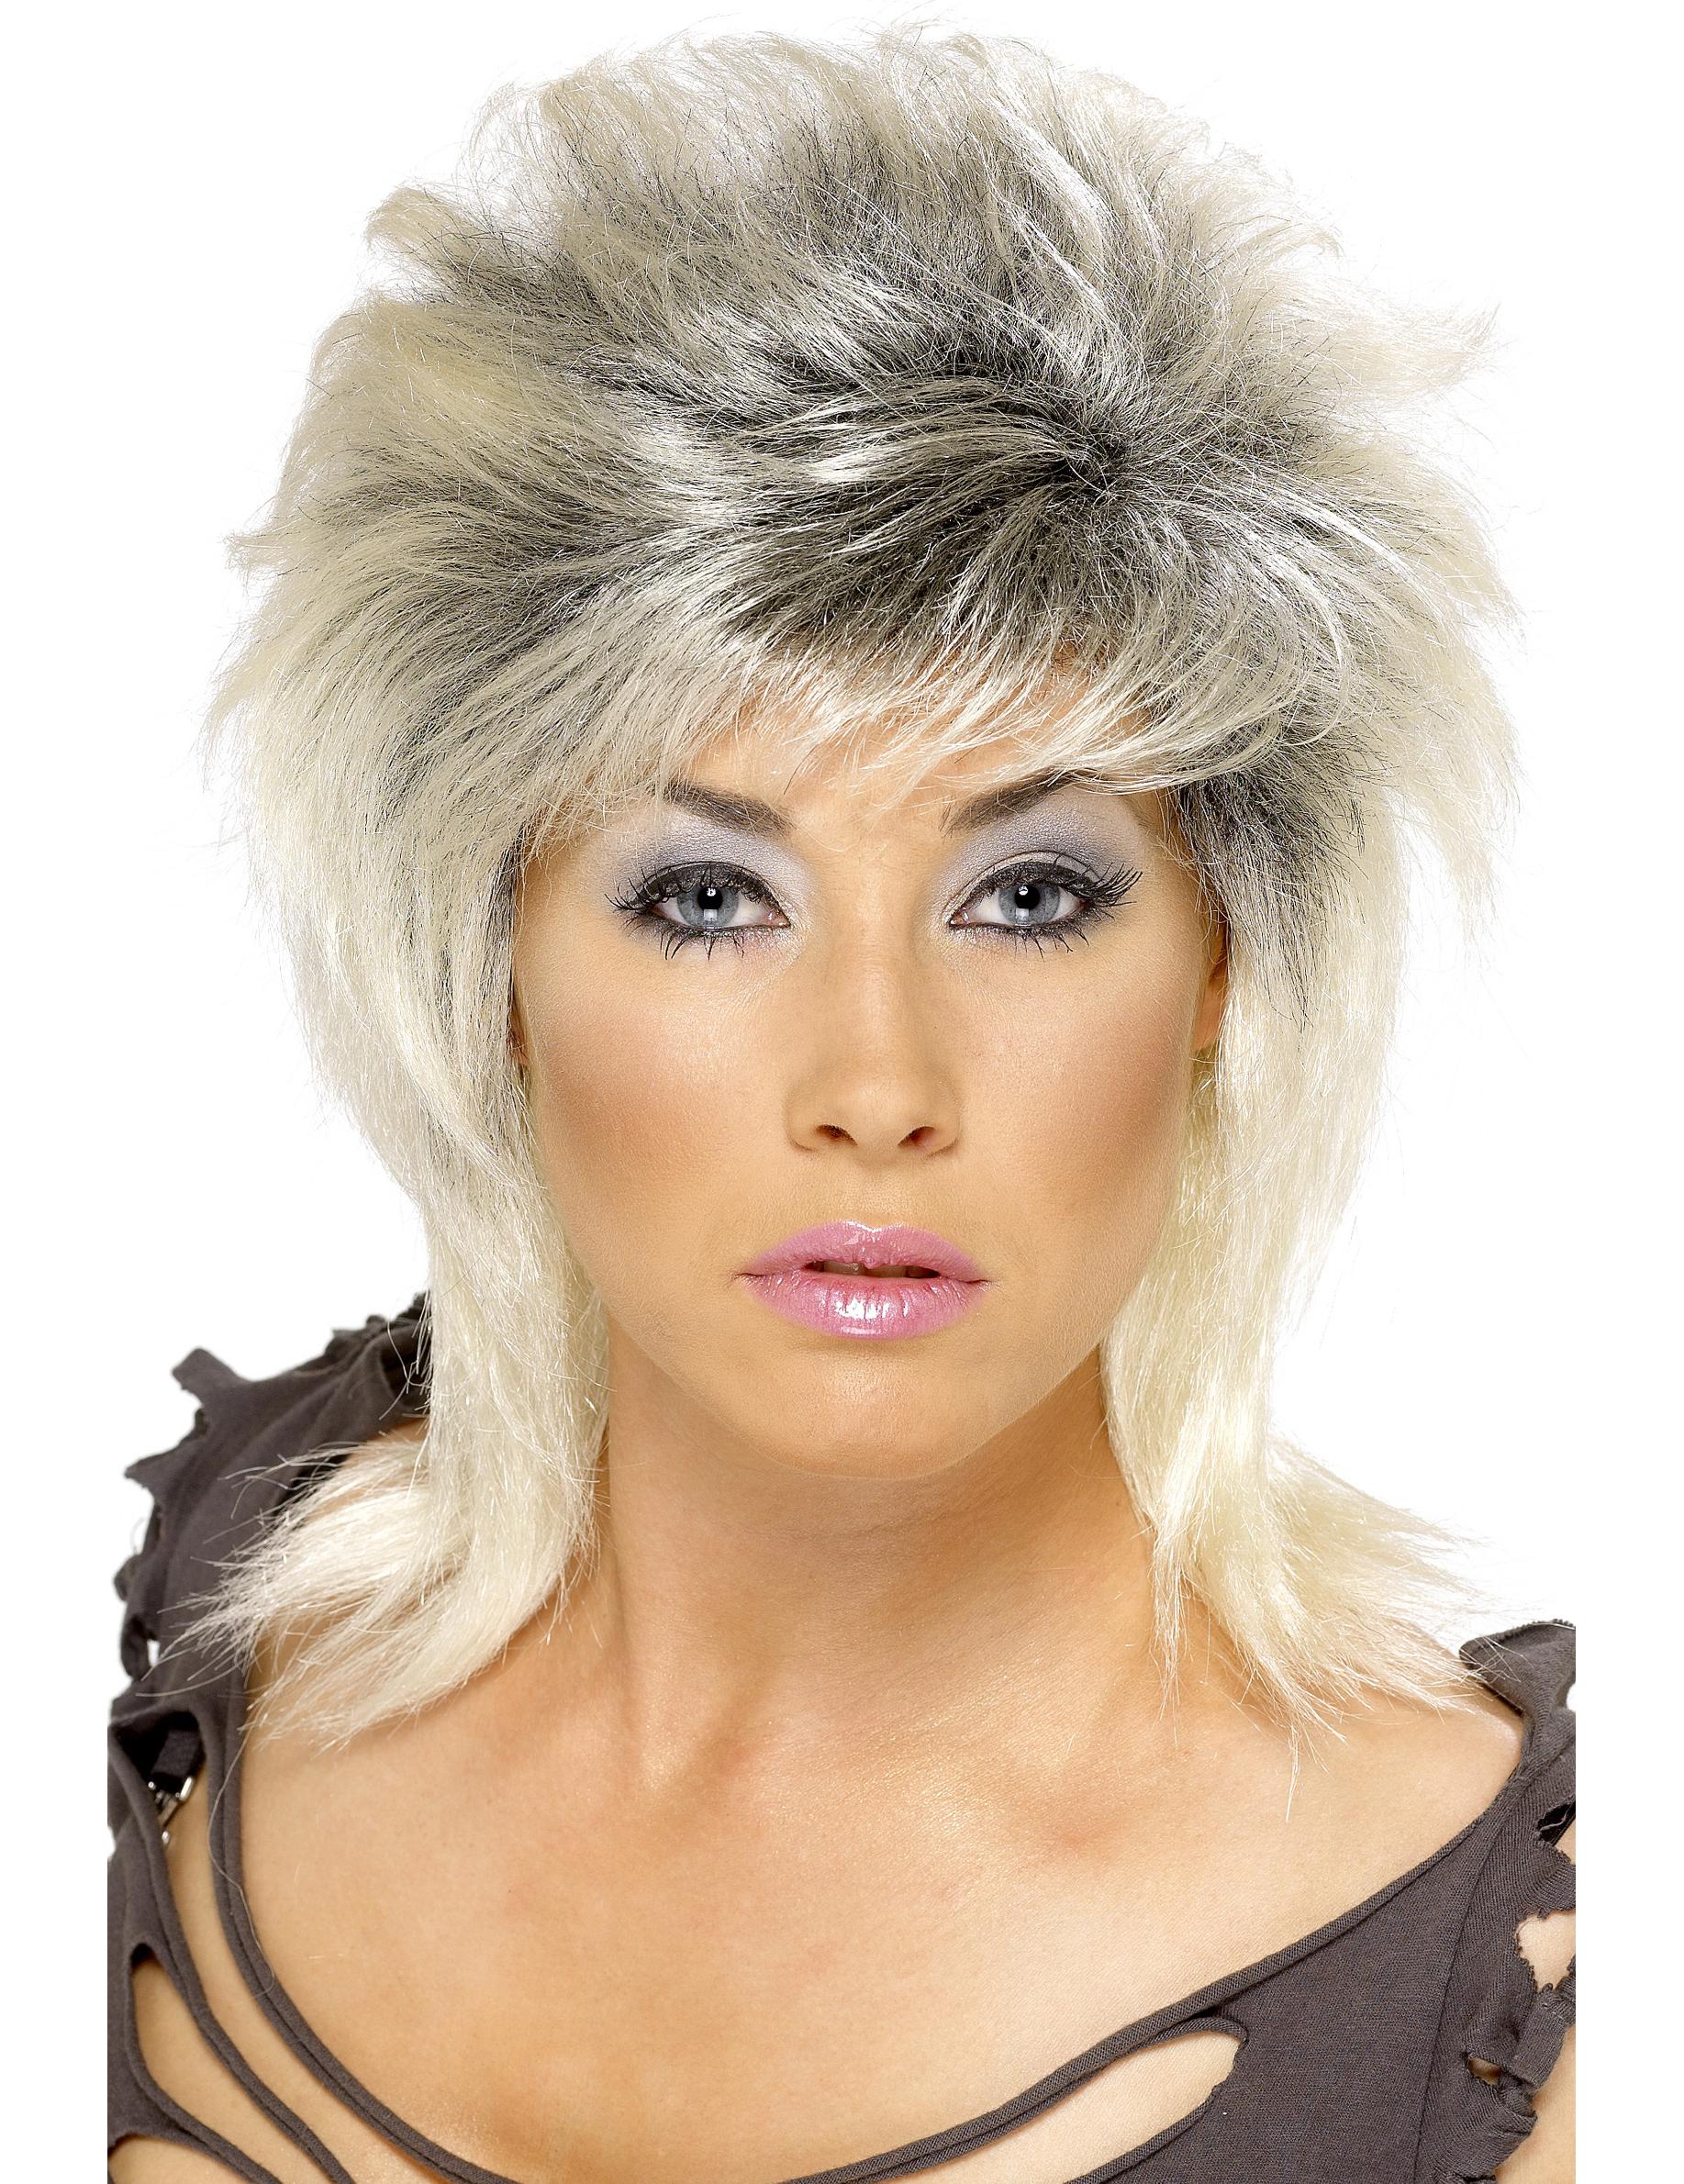 Прическа в стиле 80-х фото на короткие волосы